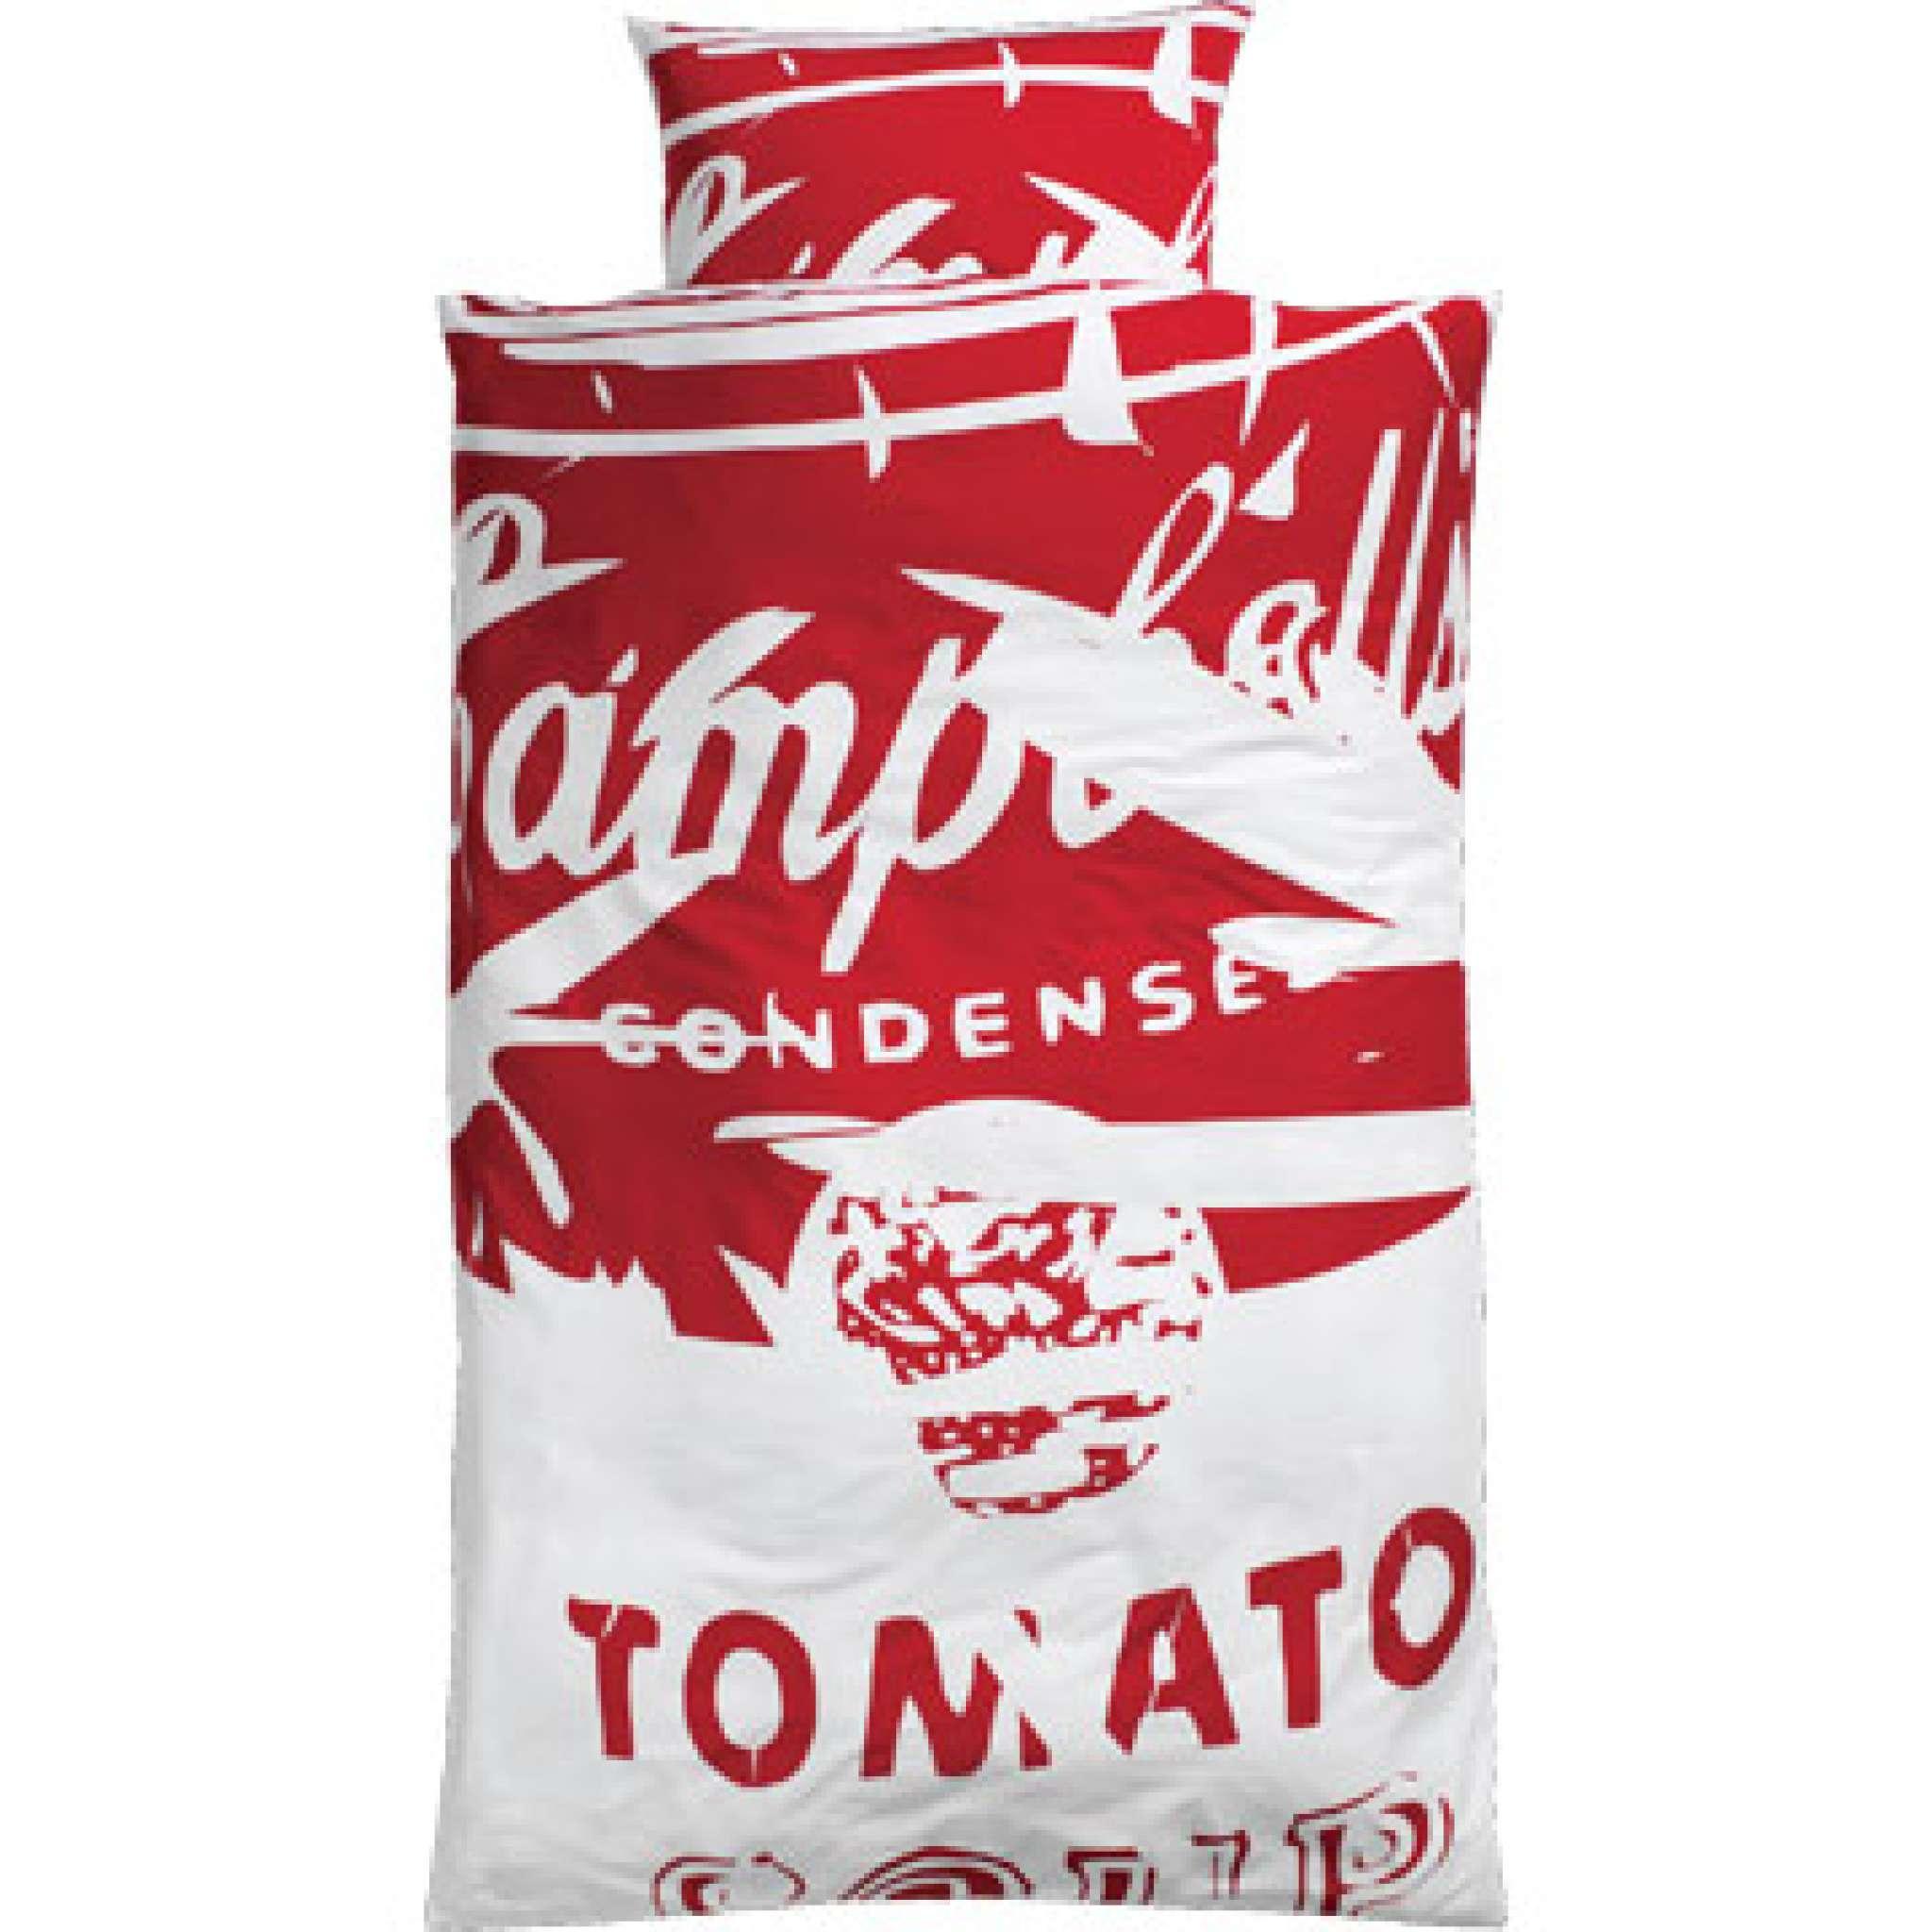 Andy Warhol, Campbells Sengesett